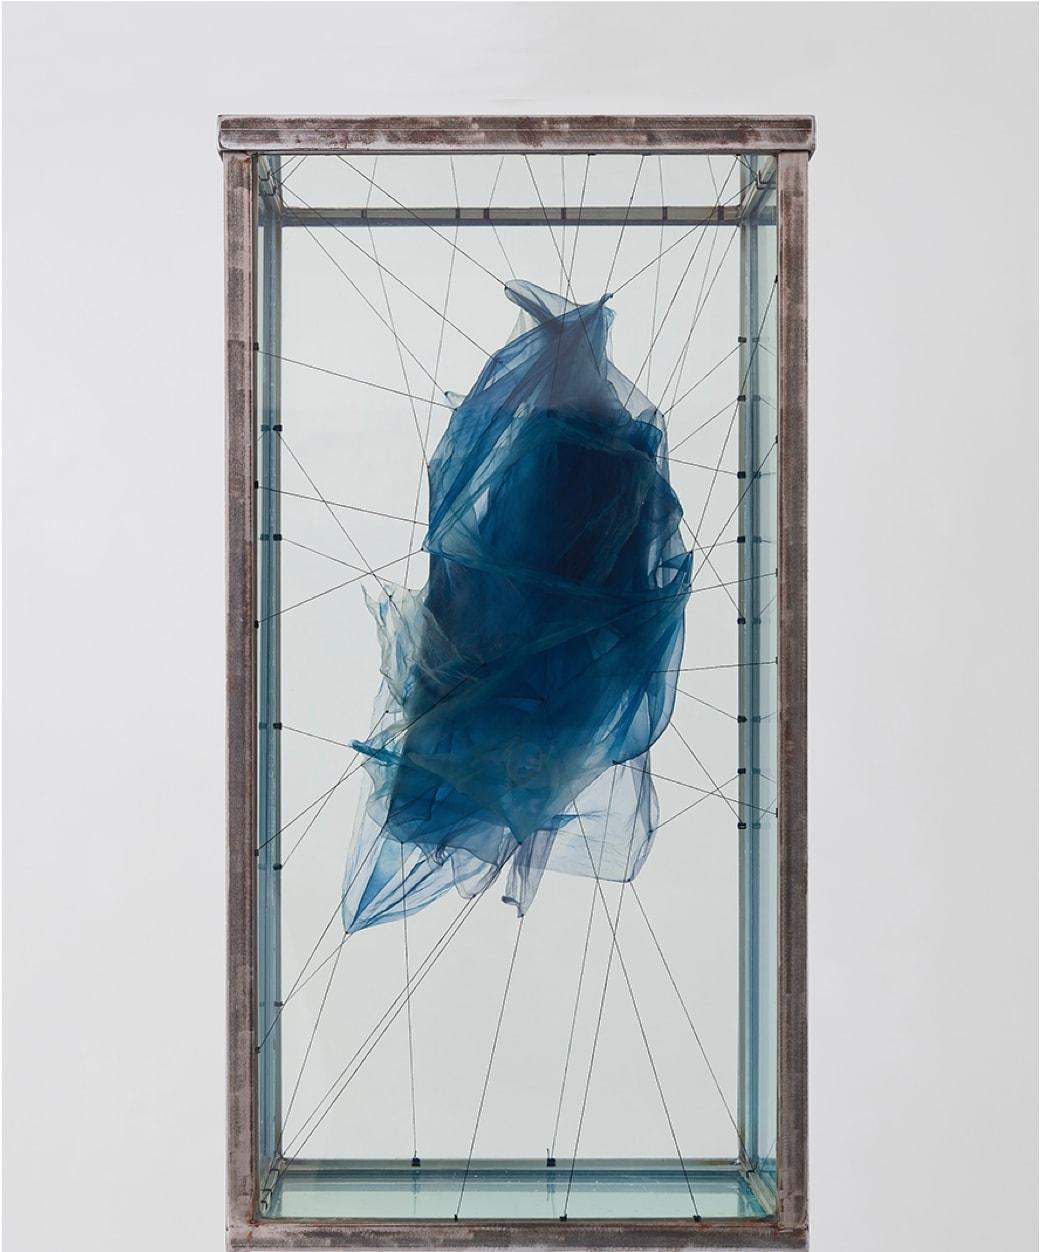 Adam Jeppesen, Object no 107 (T), 2017